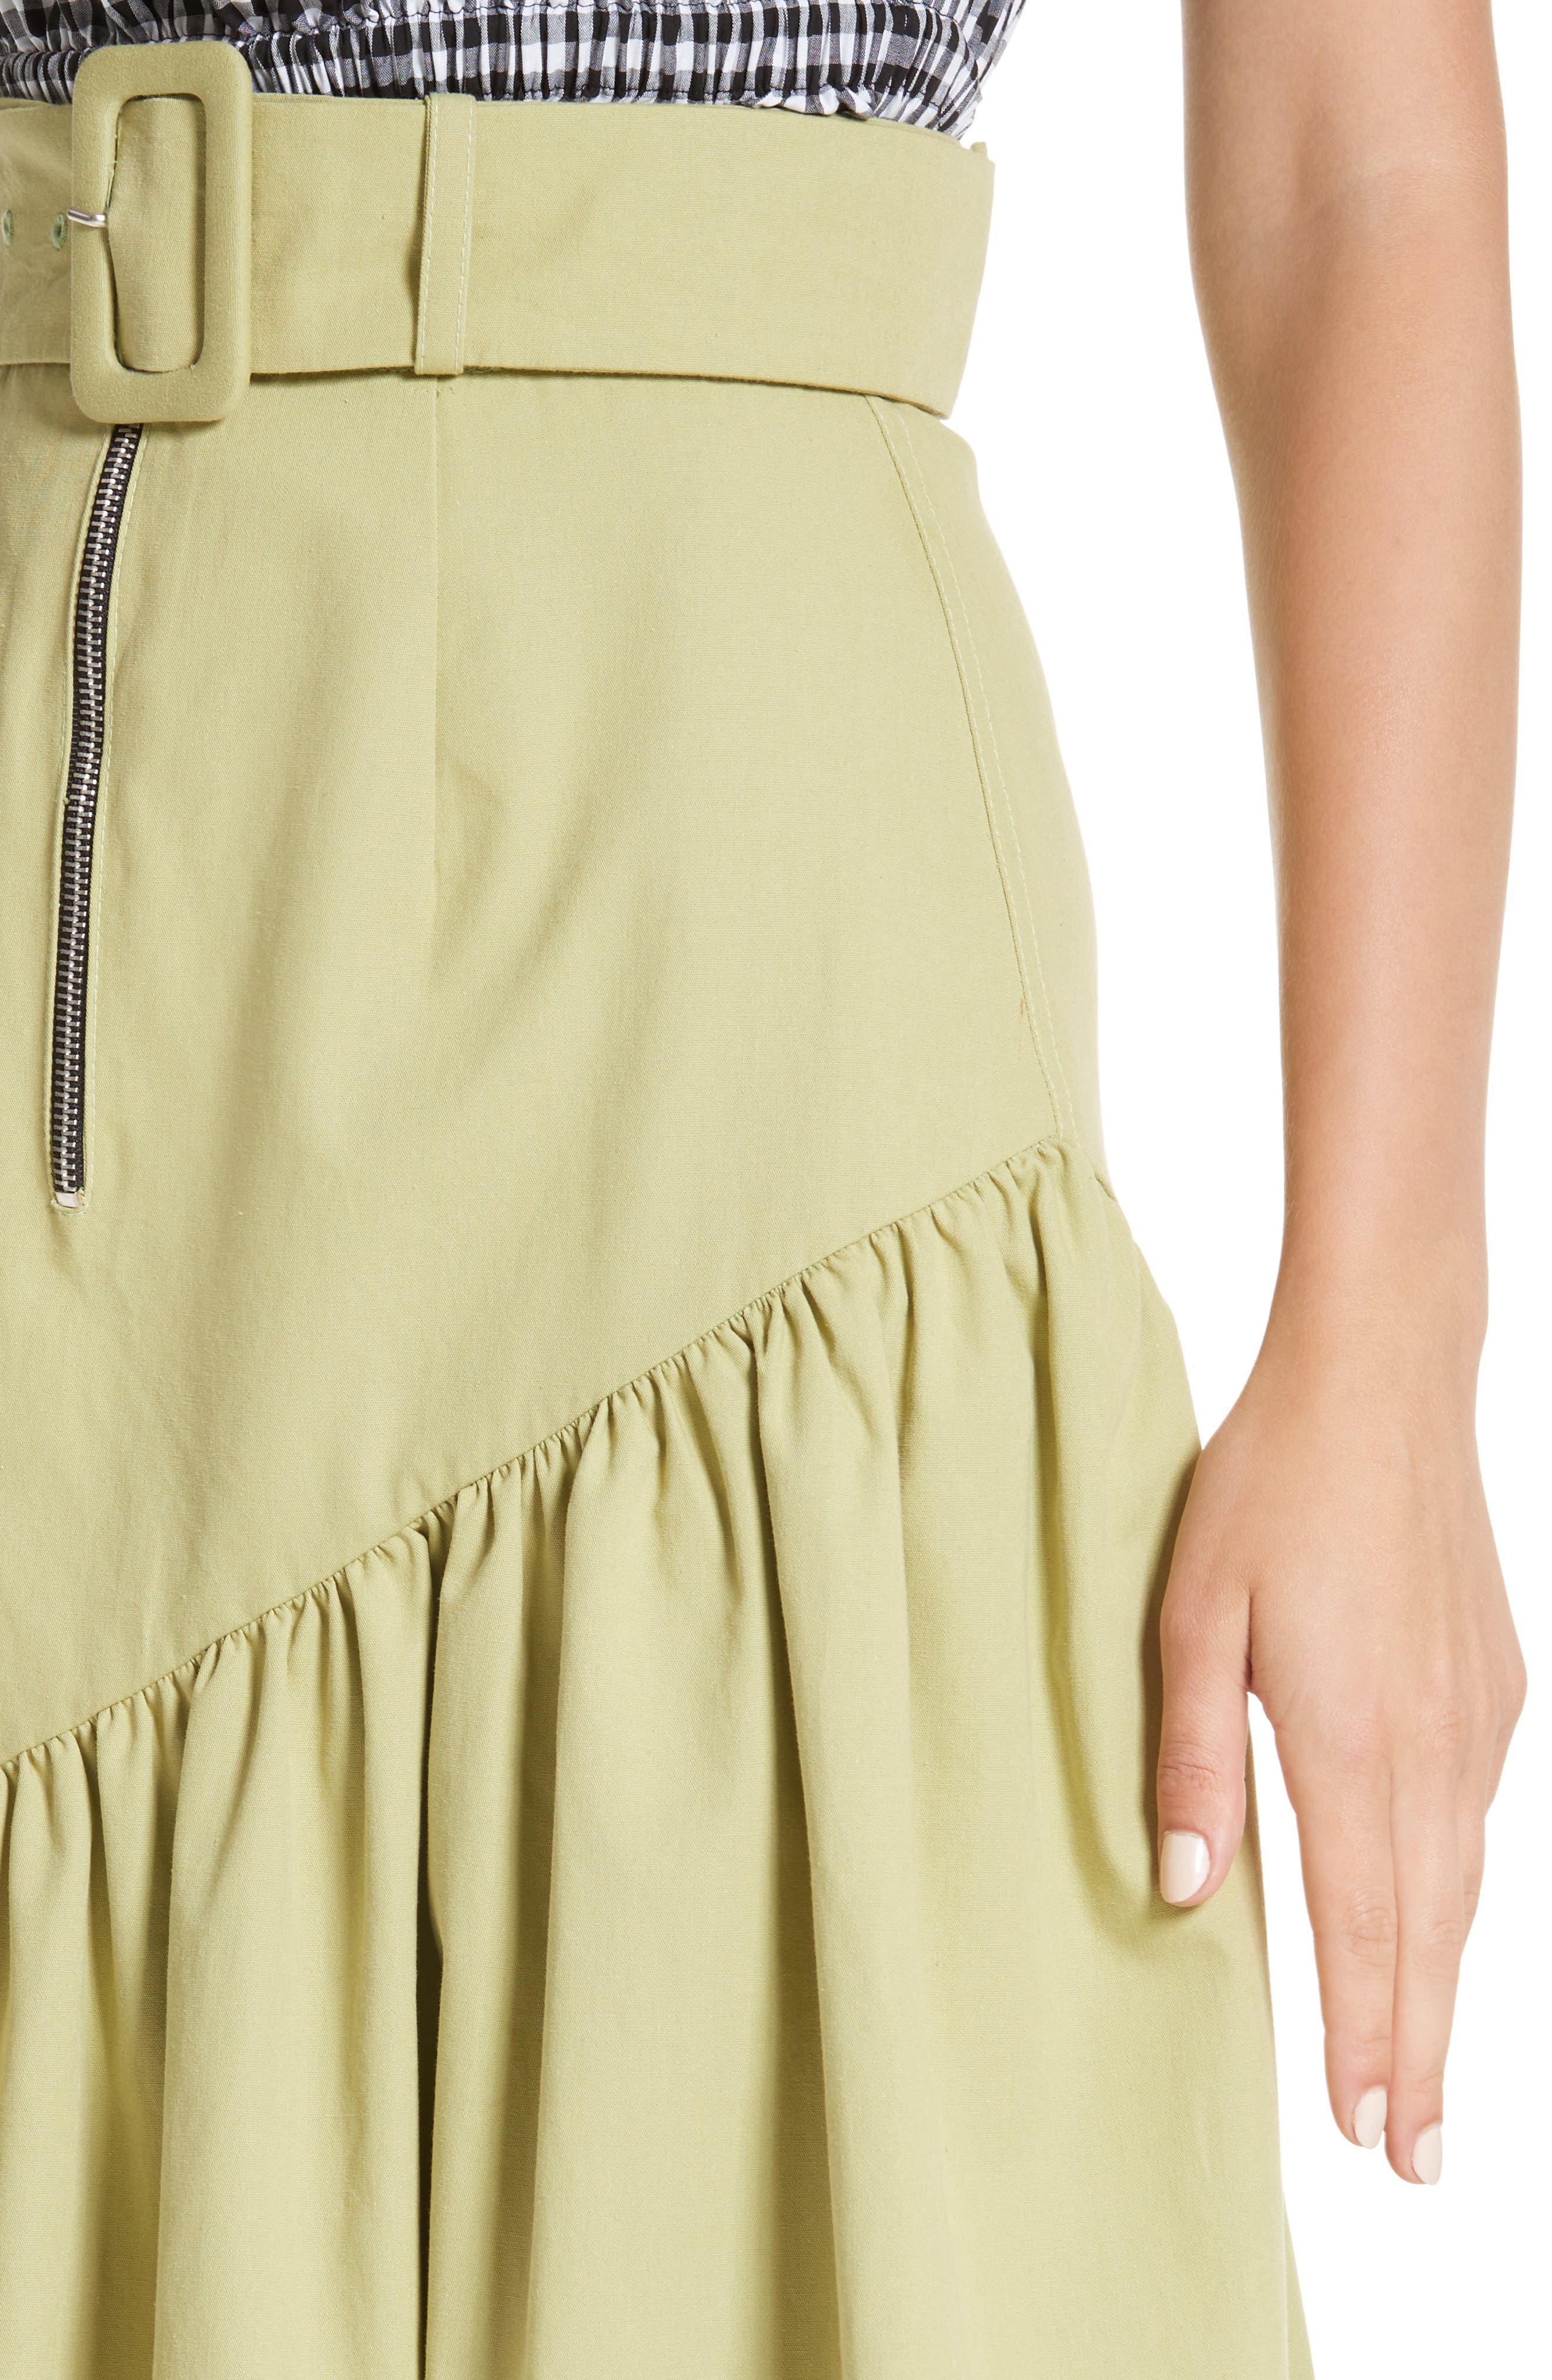 Belted High Waist Ruffle Skirt,                             Alternate thumbnail 4, color,